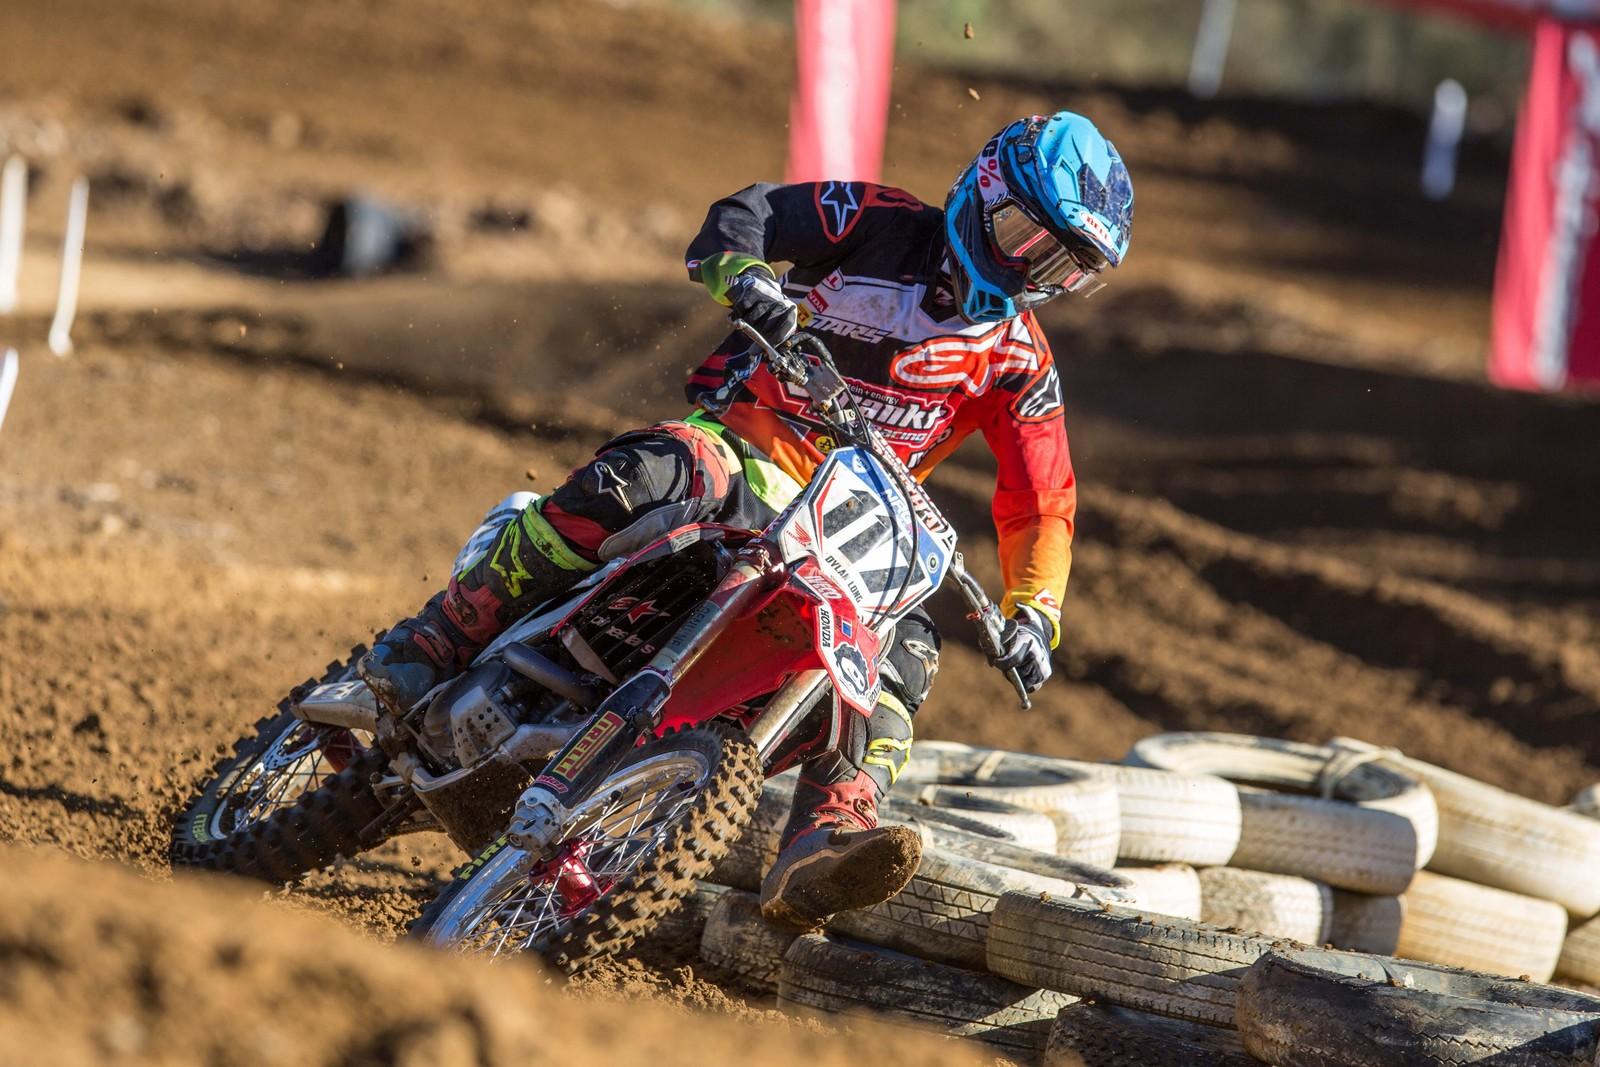 Dylan Long - Australian Motul MX Championships: Round 6, Nowra - Motocross Pictures - Vital MX